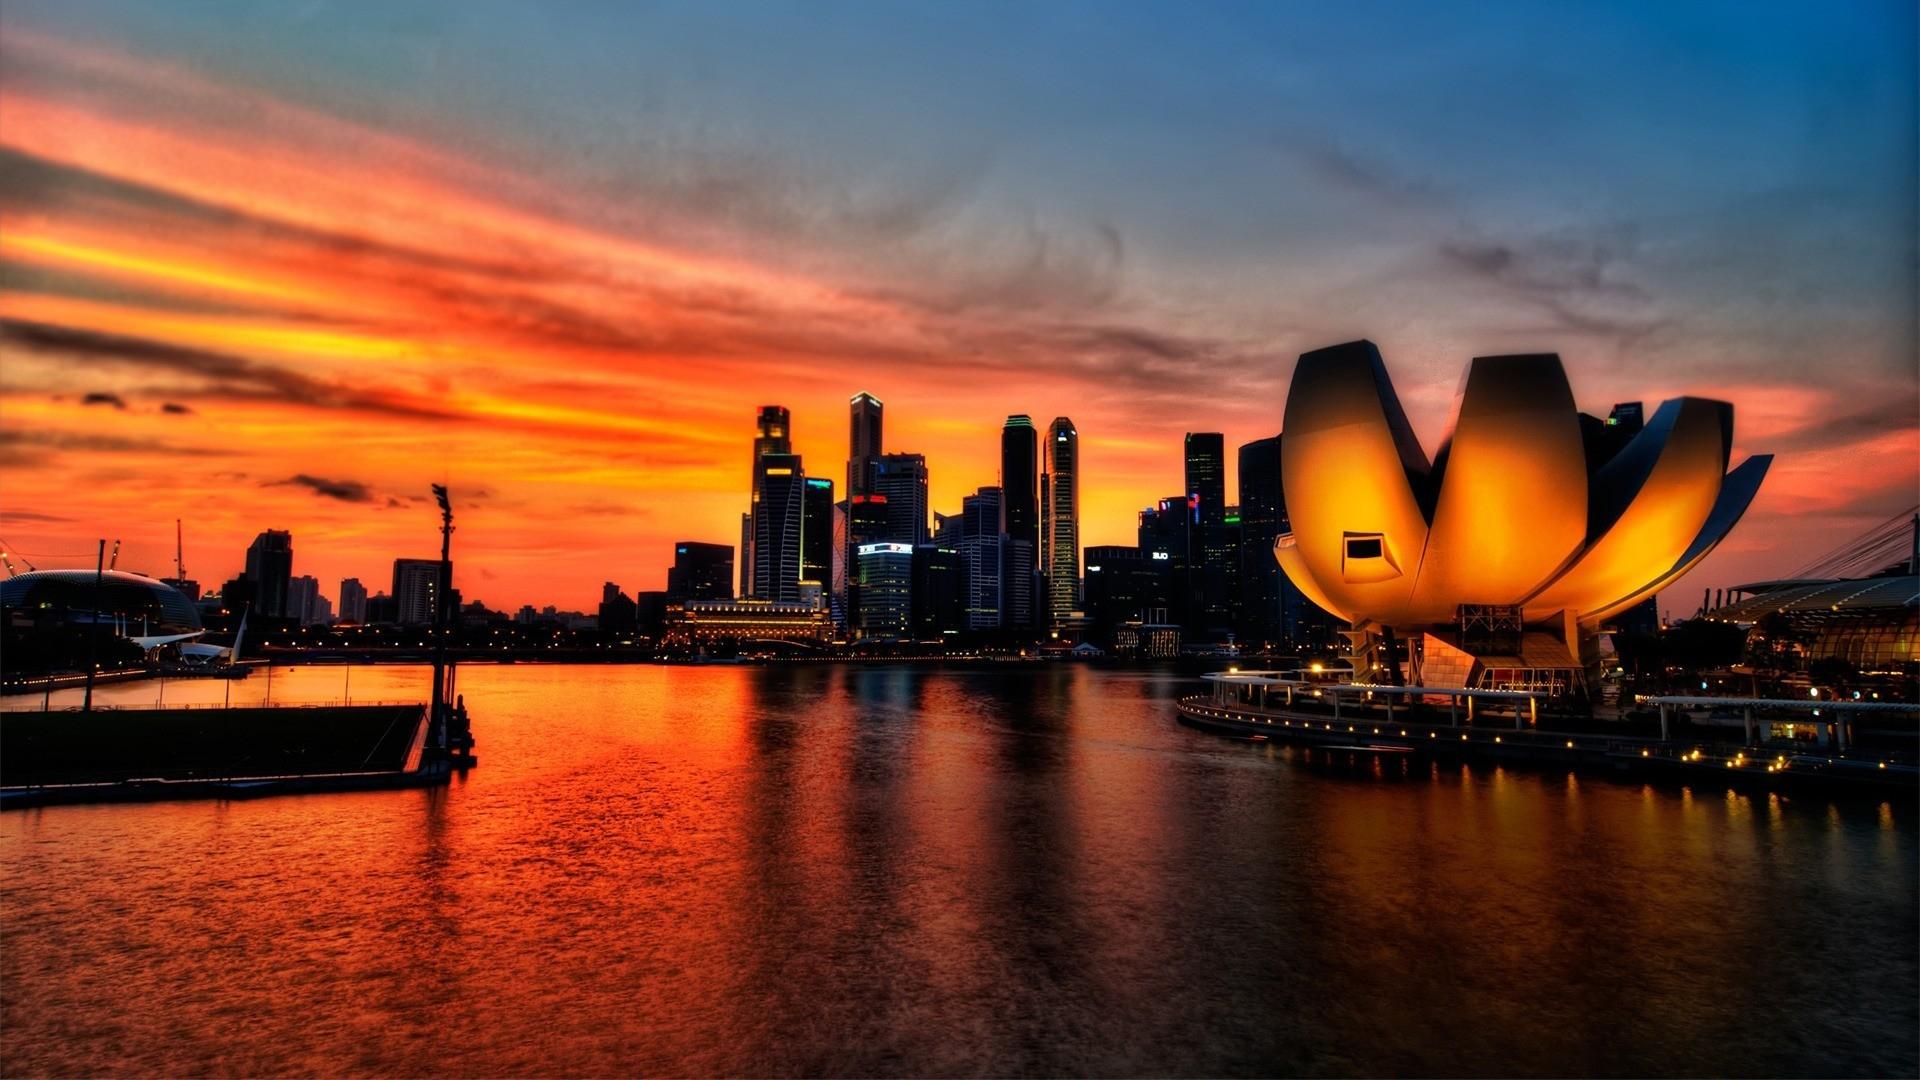 Download 1920x1080 HD Wallpaper sunset singapore megapolis bay 1920x1080